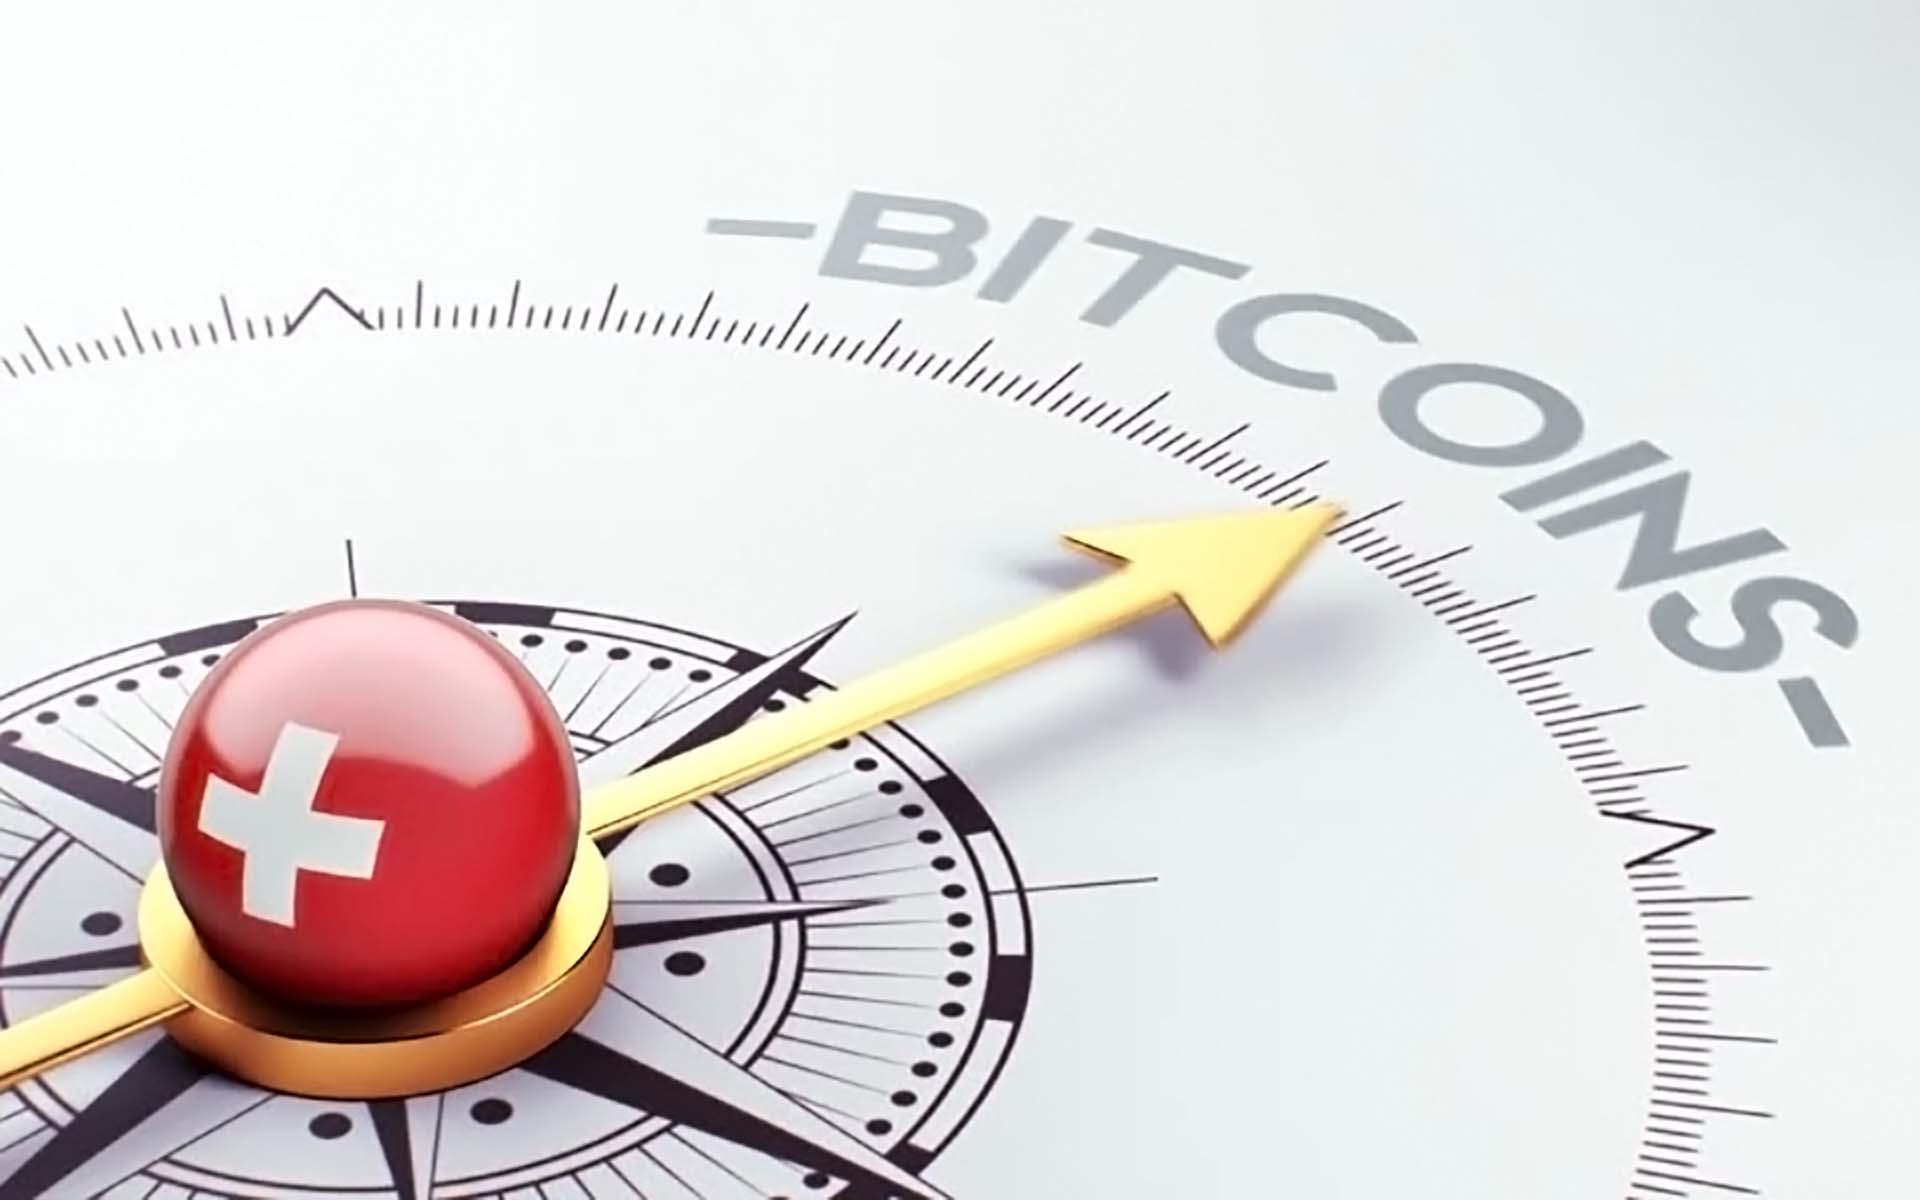 Two New Bitcoin Futures Hit Switzerland As Finma Slams JPMorgan